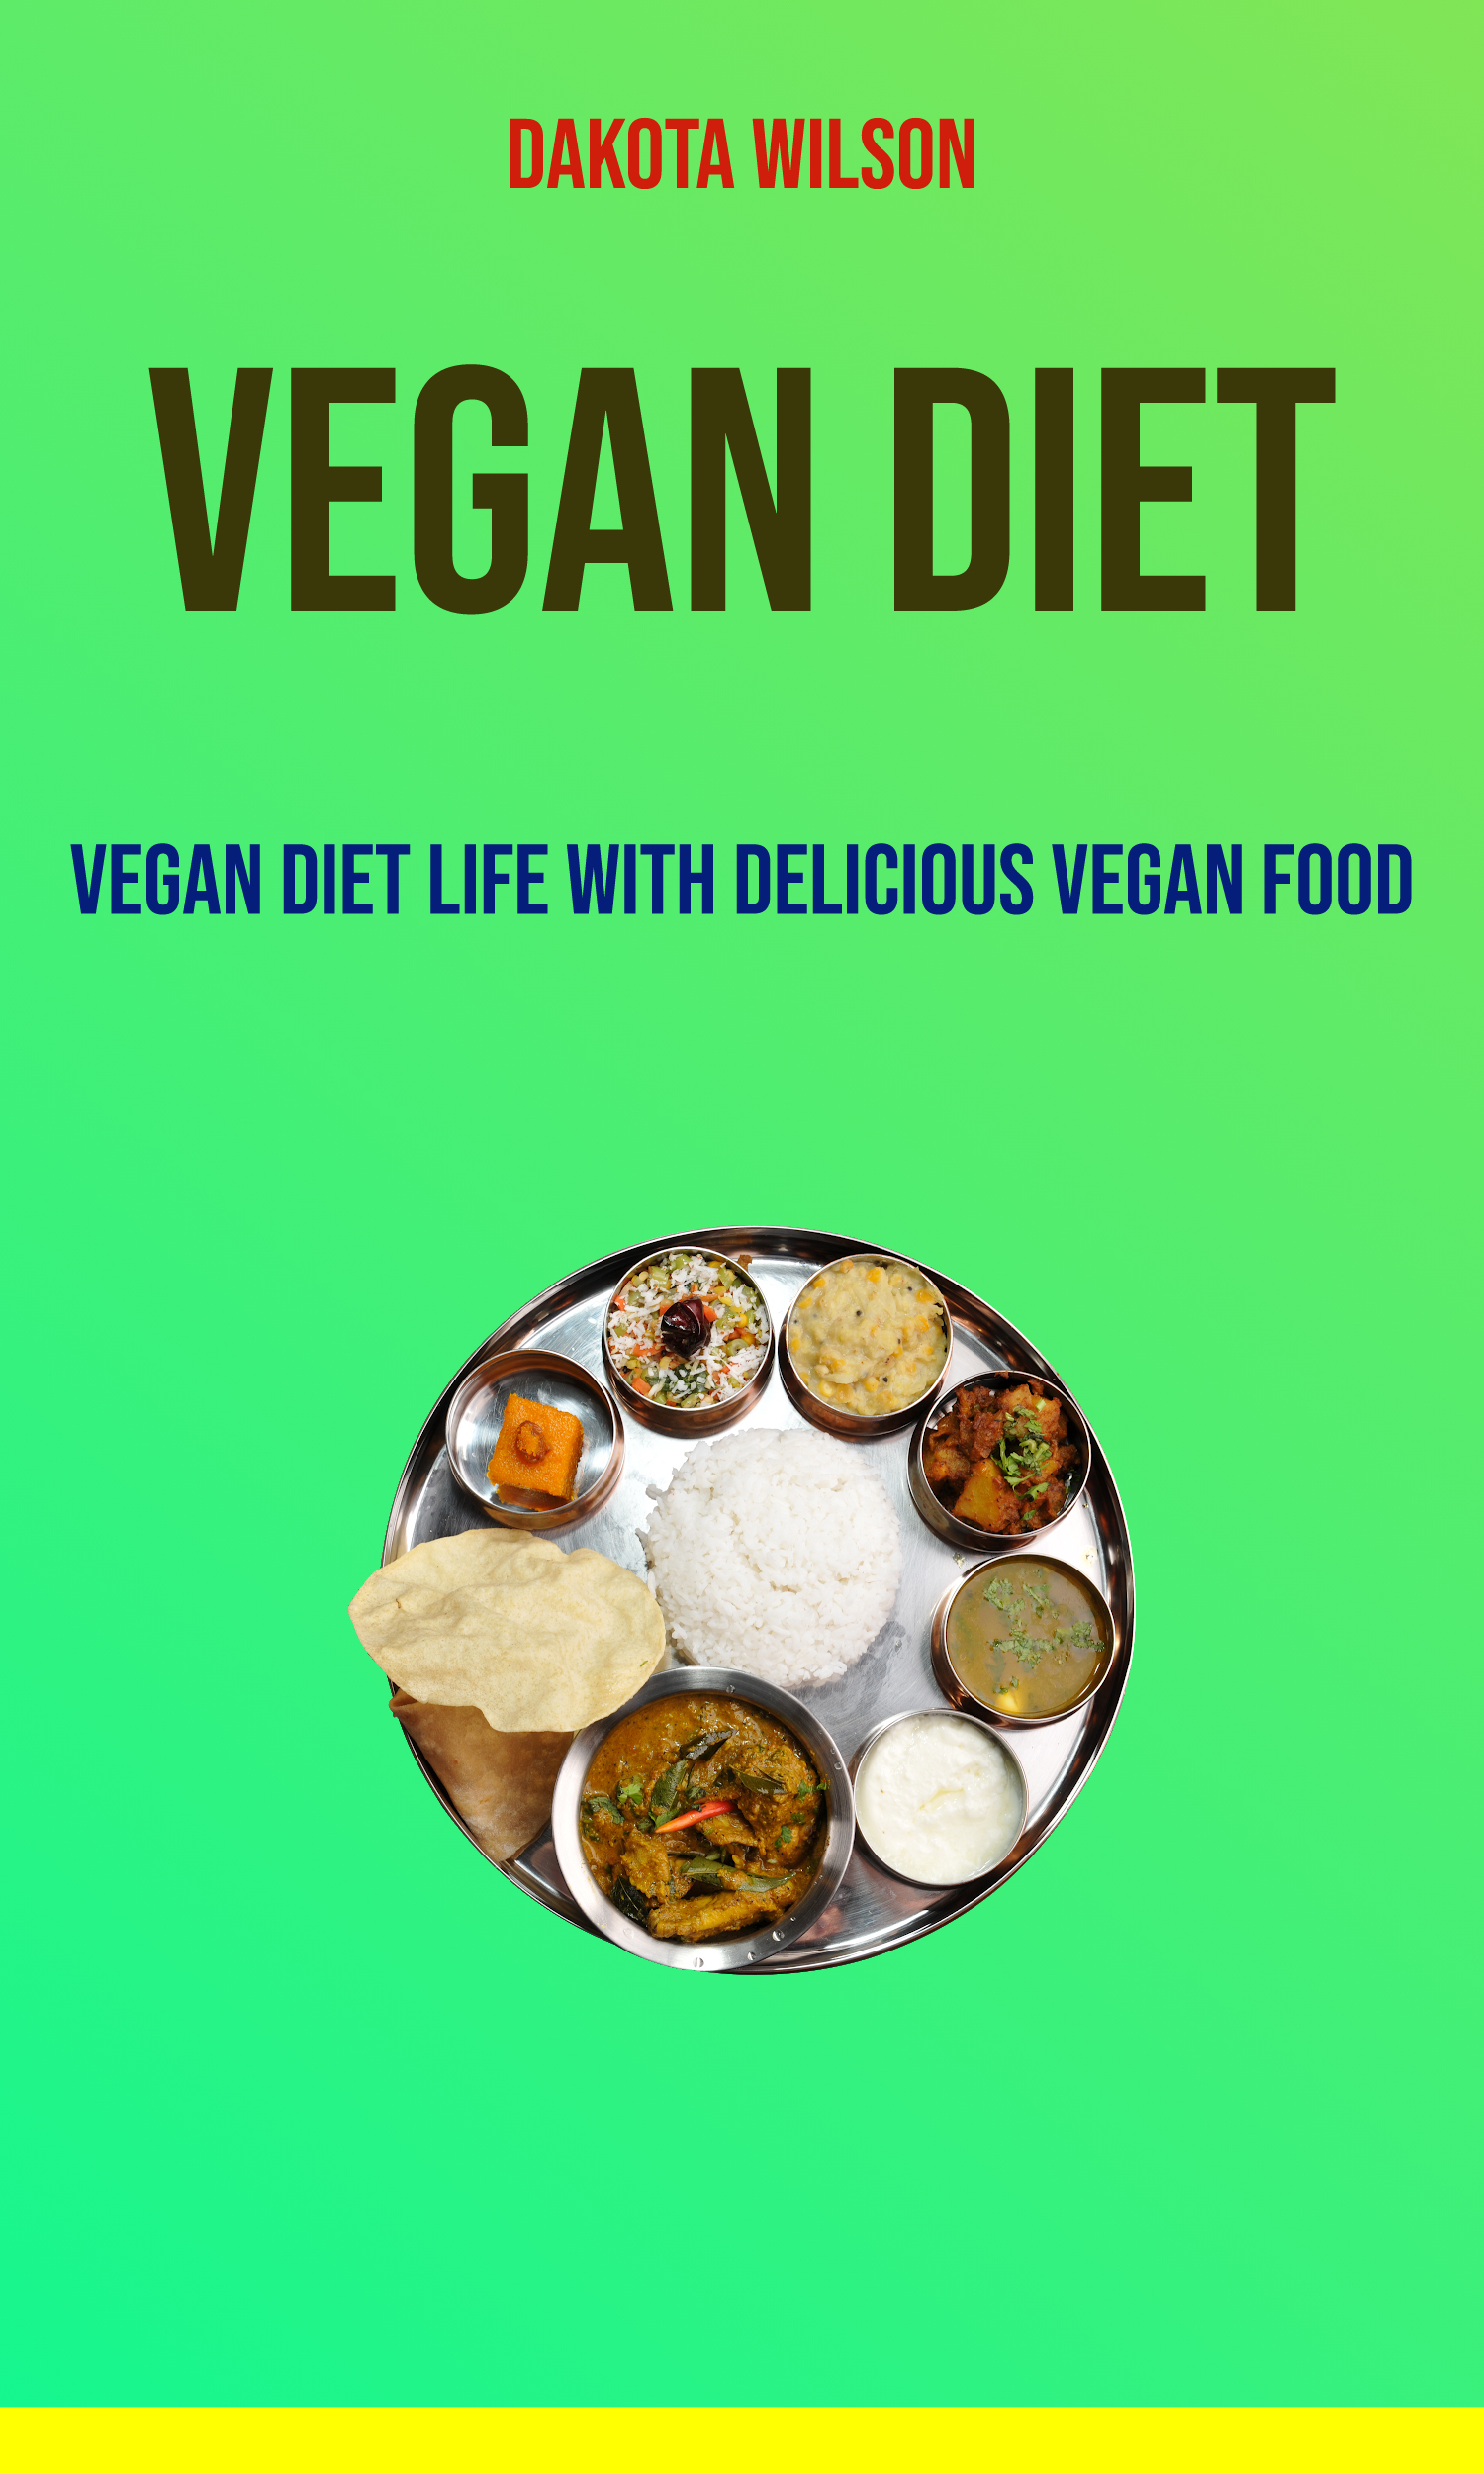 Vegan diet: vegan diet life with delicious vegan food